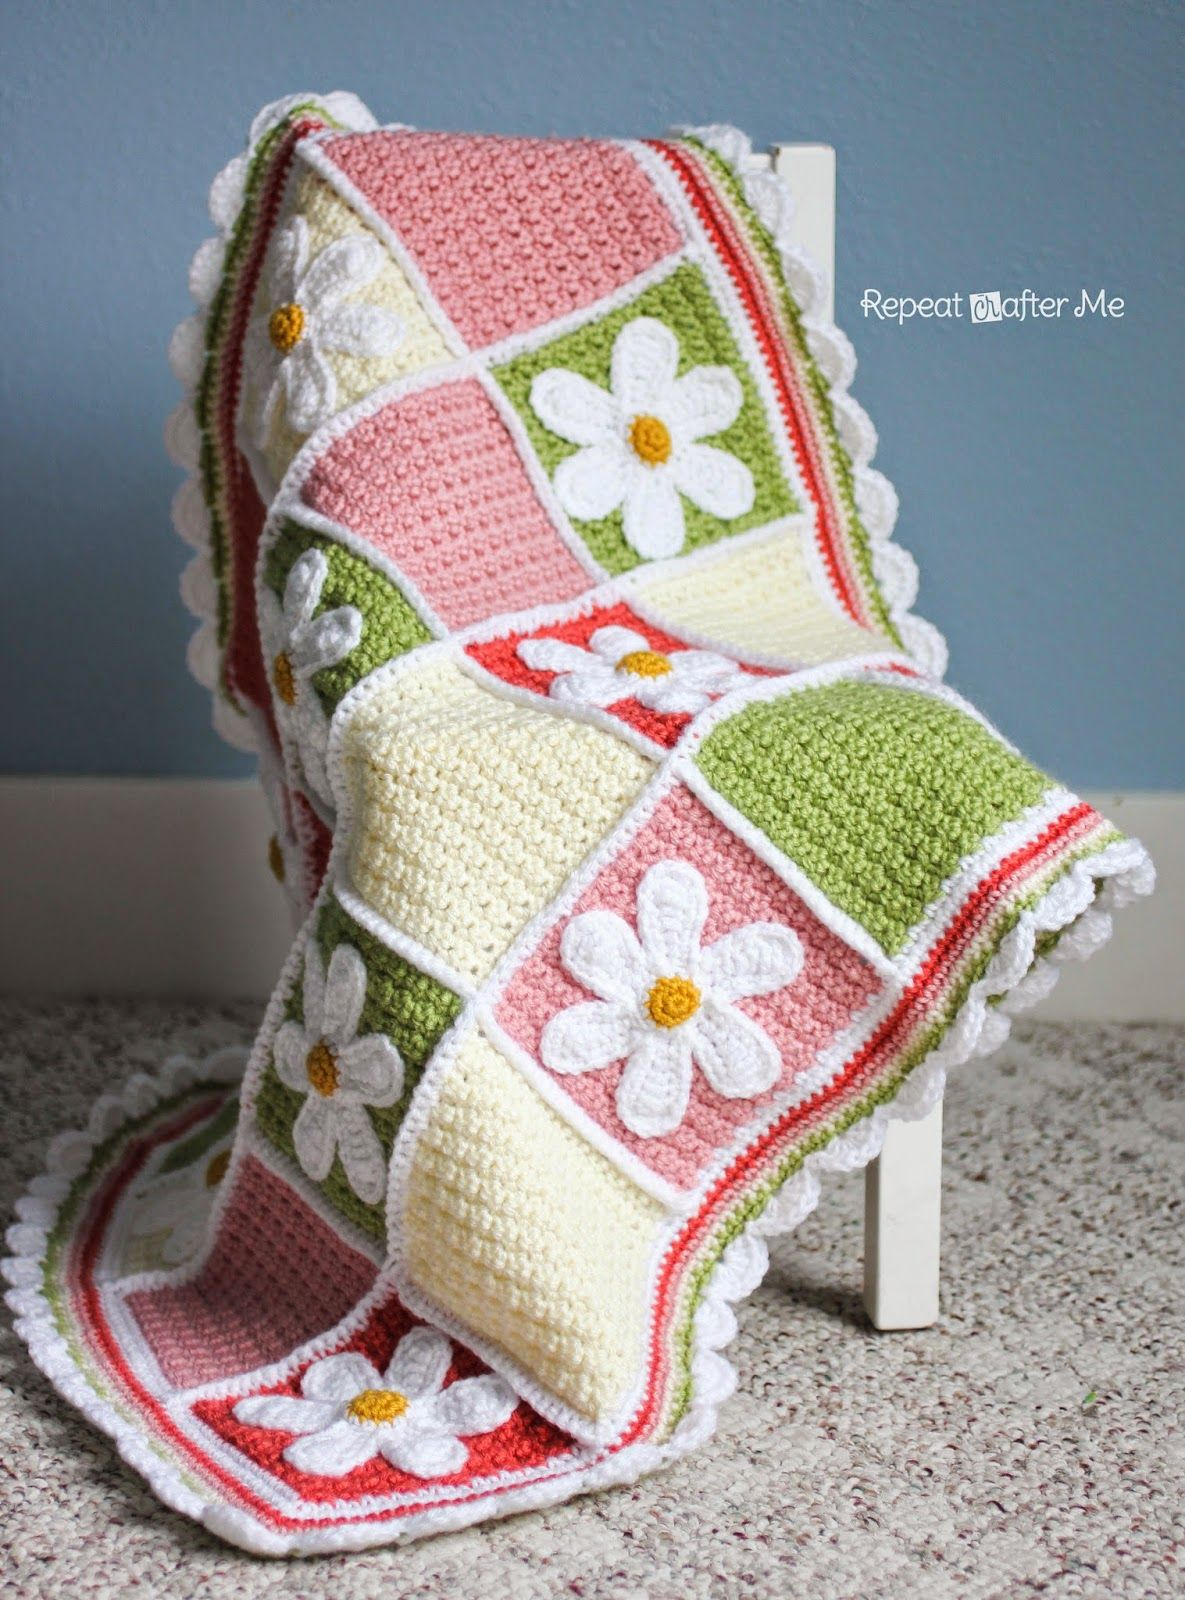 Crochet daisy afghan crochet daisy afghans and crochet crochet daisy afghan free crochet blanket patternsafghan bankloansurffo Choice Image